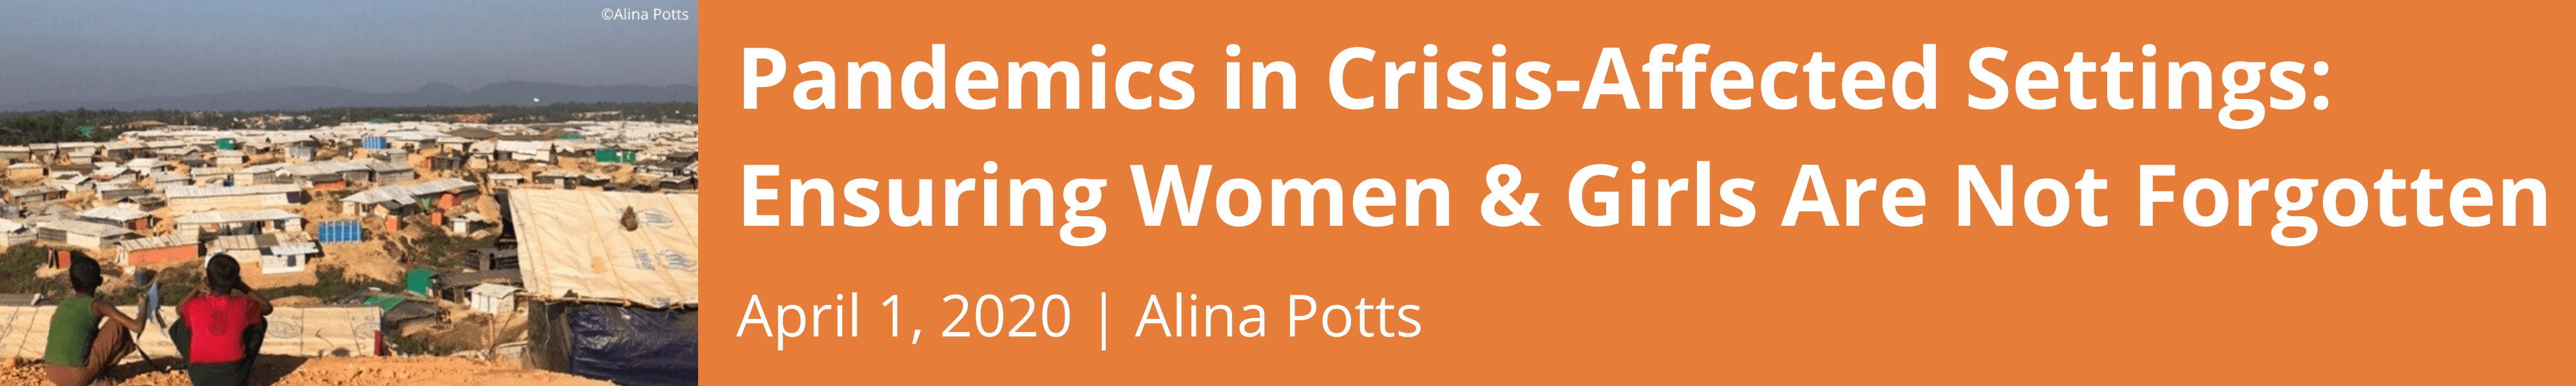 Pandemics in Crisis-Affected Settings: Ensuring Women & Girls Are Not Forgotten